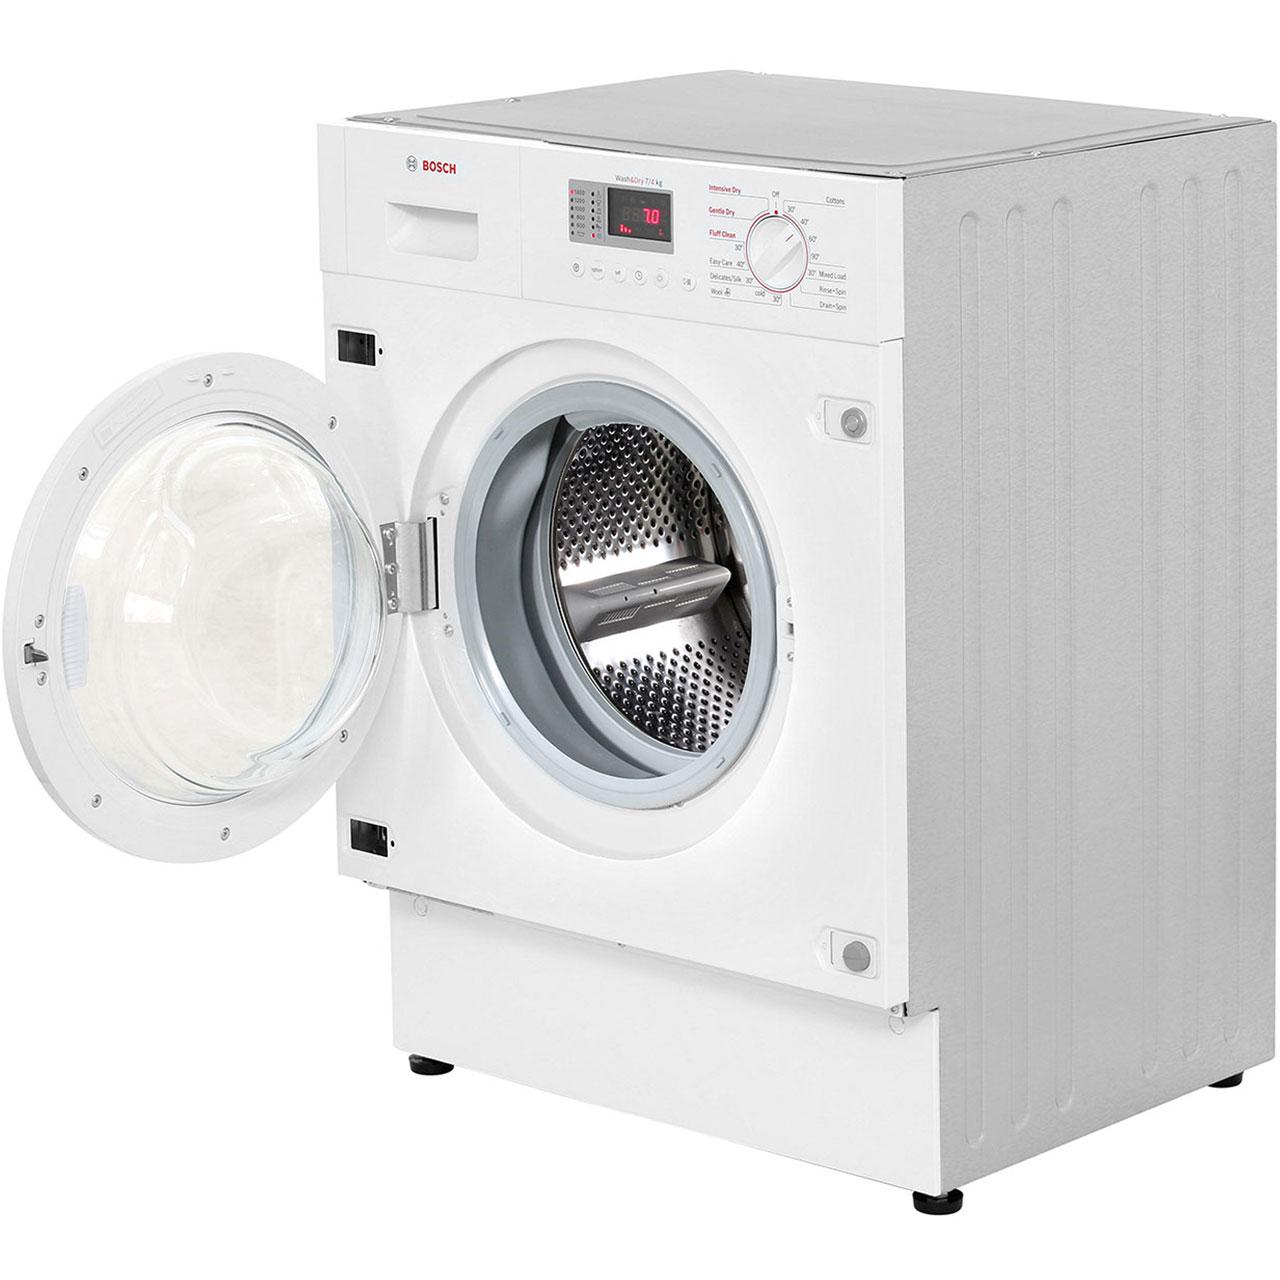 bosch wkd28351gb serie 4 built in 7kg washer dryer white. Black Bedroom Furniture Sets. Home Design Ideas